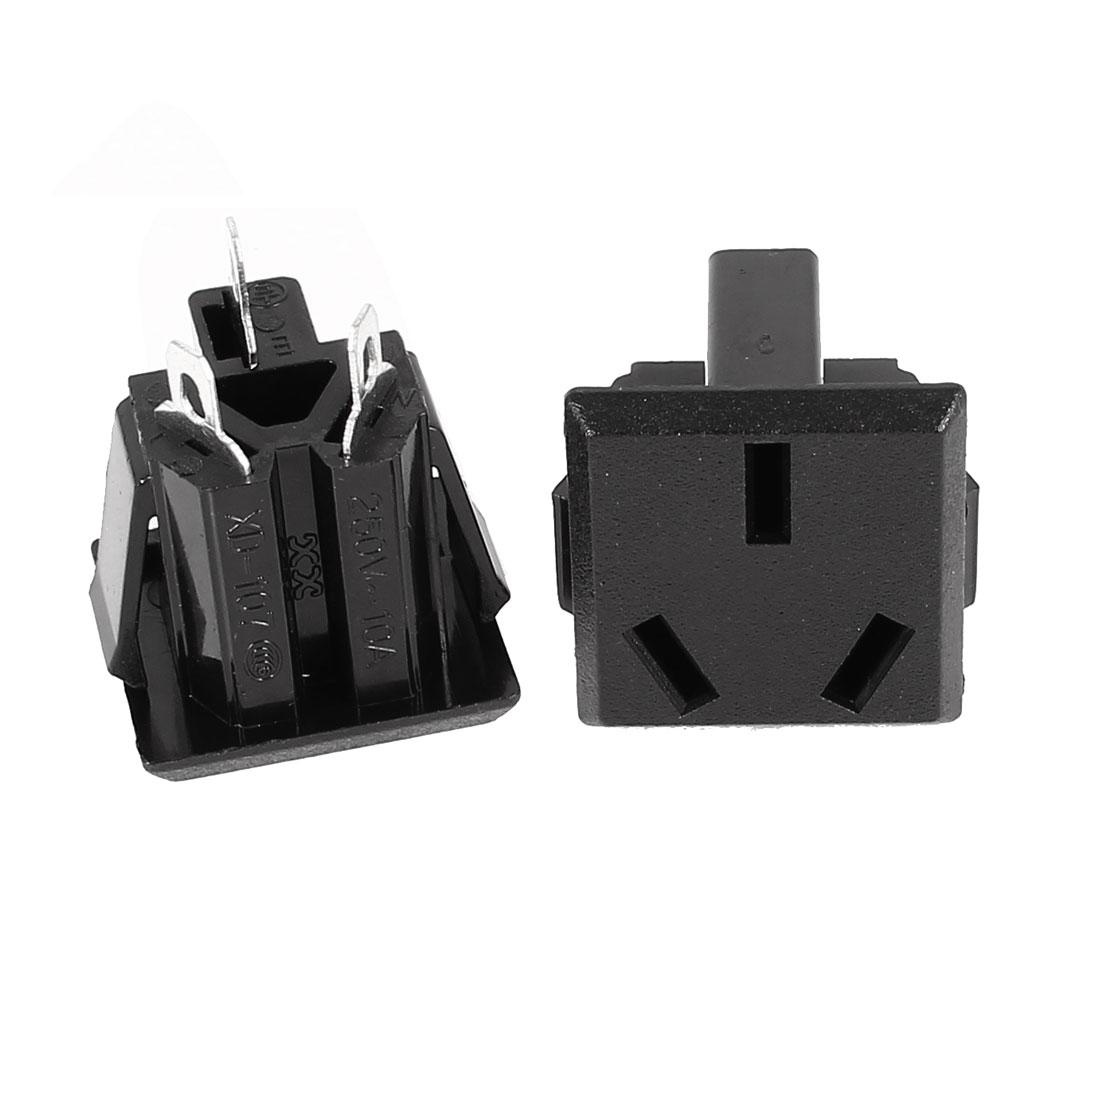 2 Pcs Square Shaped AU 3 Terminals Power Socket Adapter AC 250V 10A